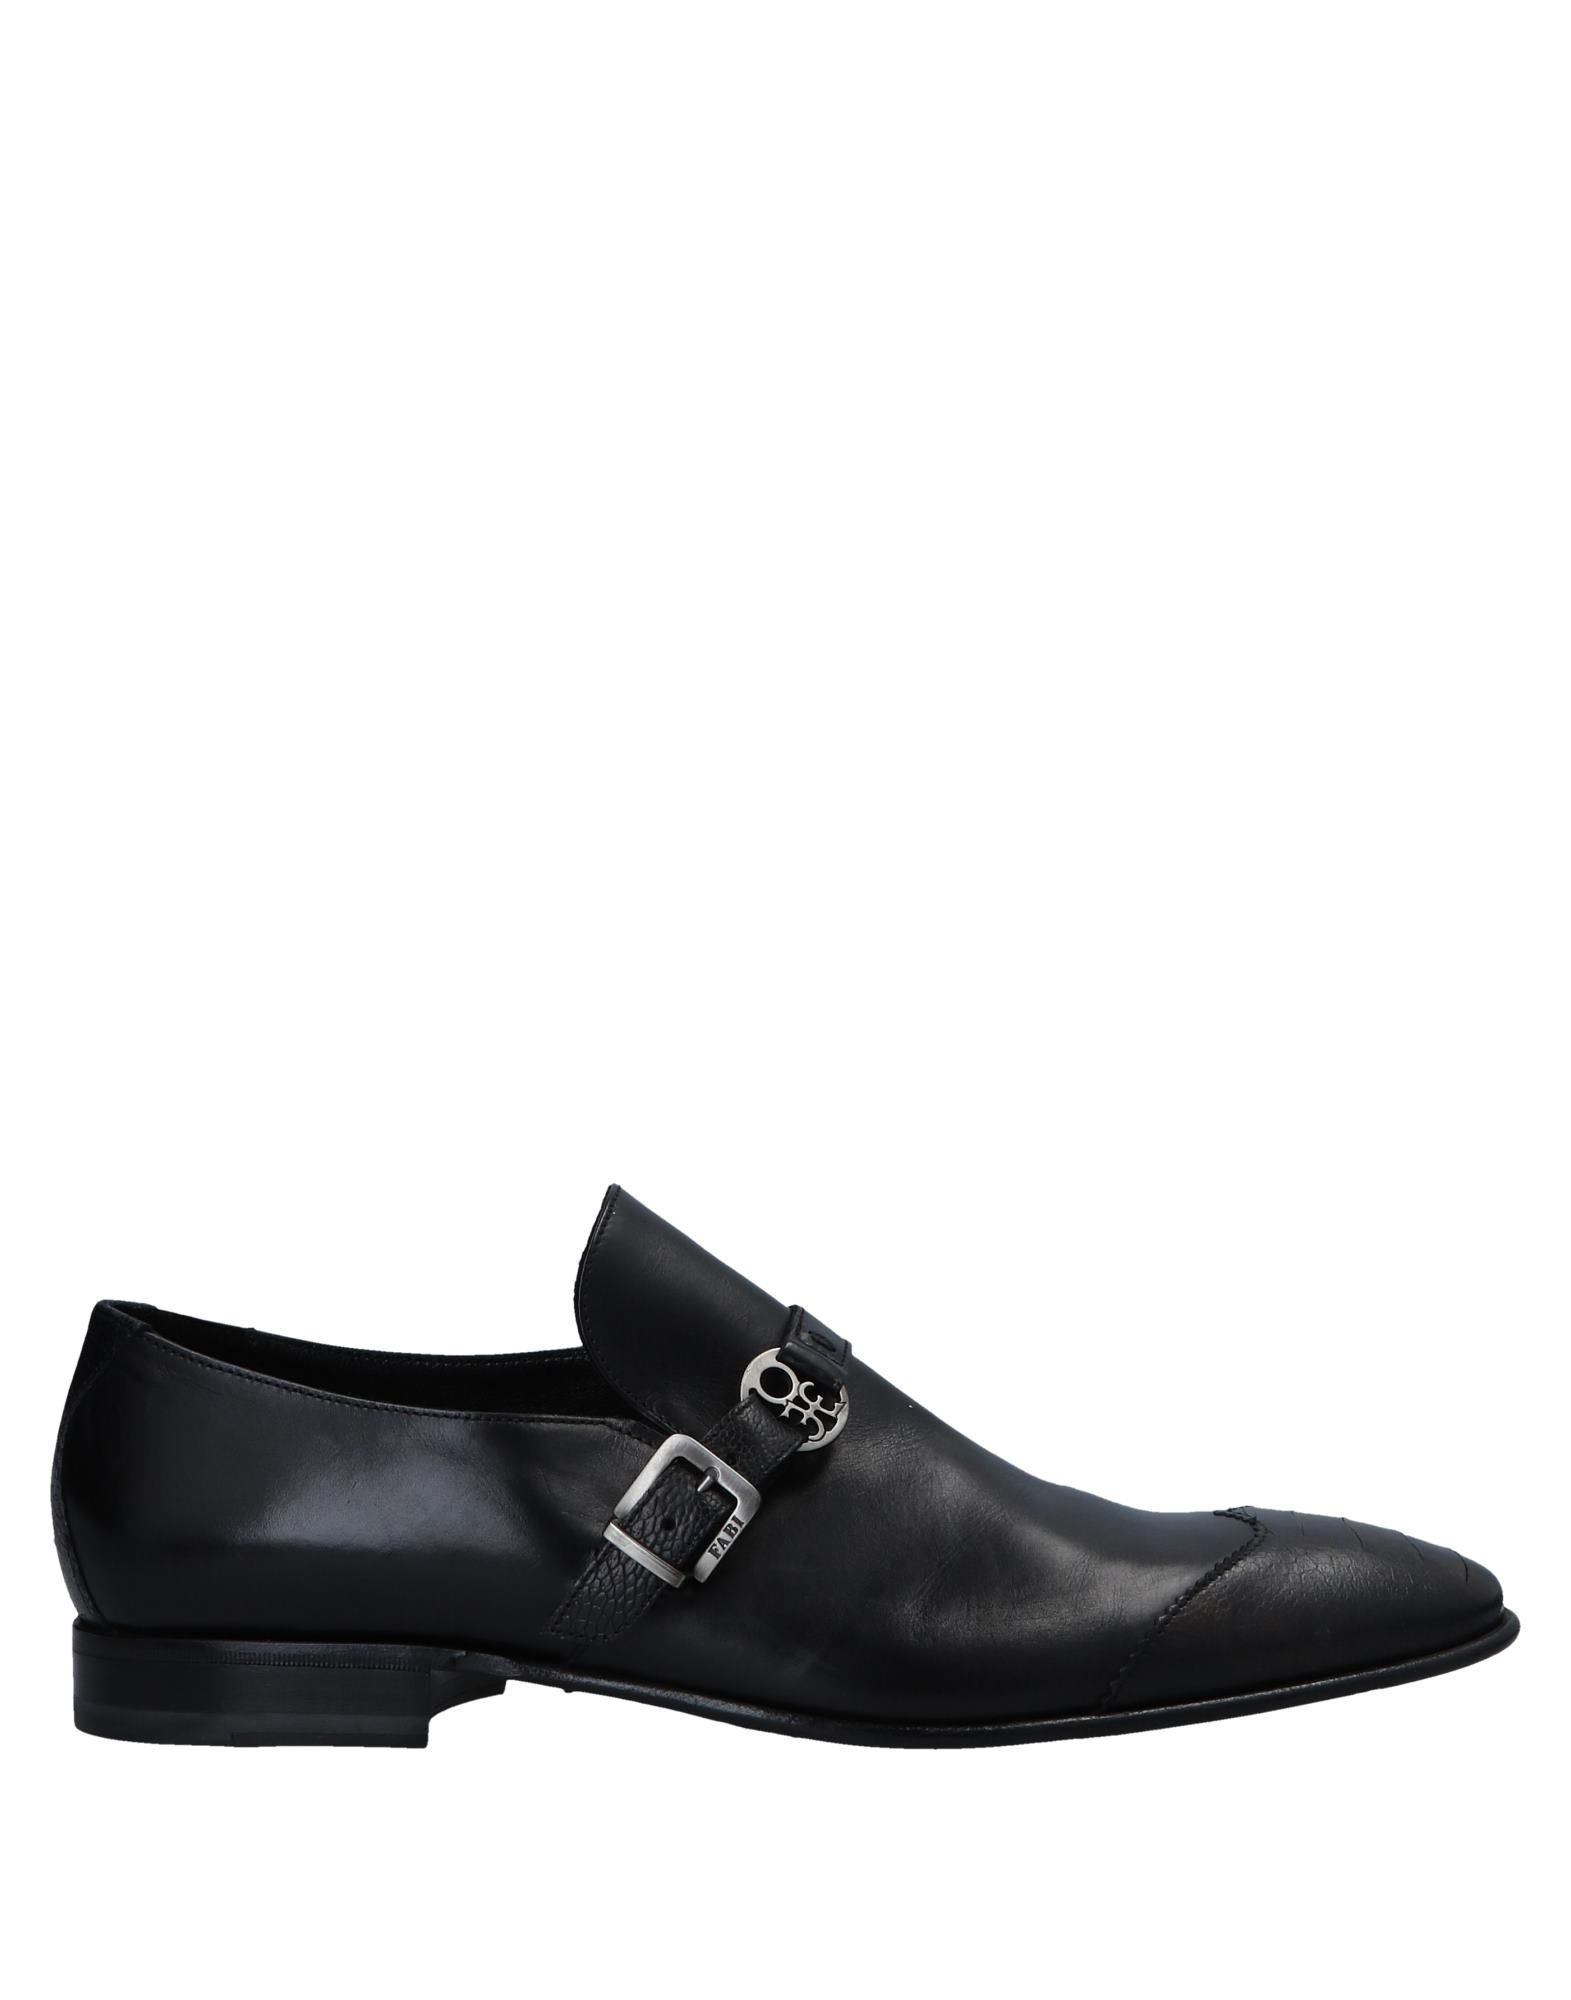 Fabi Mokassins Qualität Herren  11550008HF Gute Qualität Mokassins beliebte Schuhe ef85f4